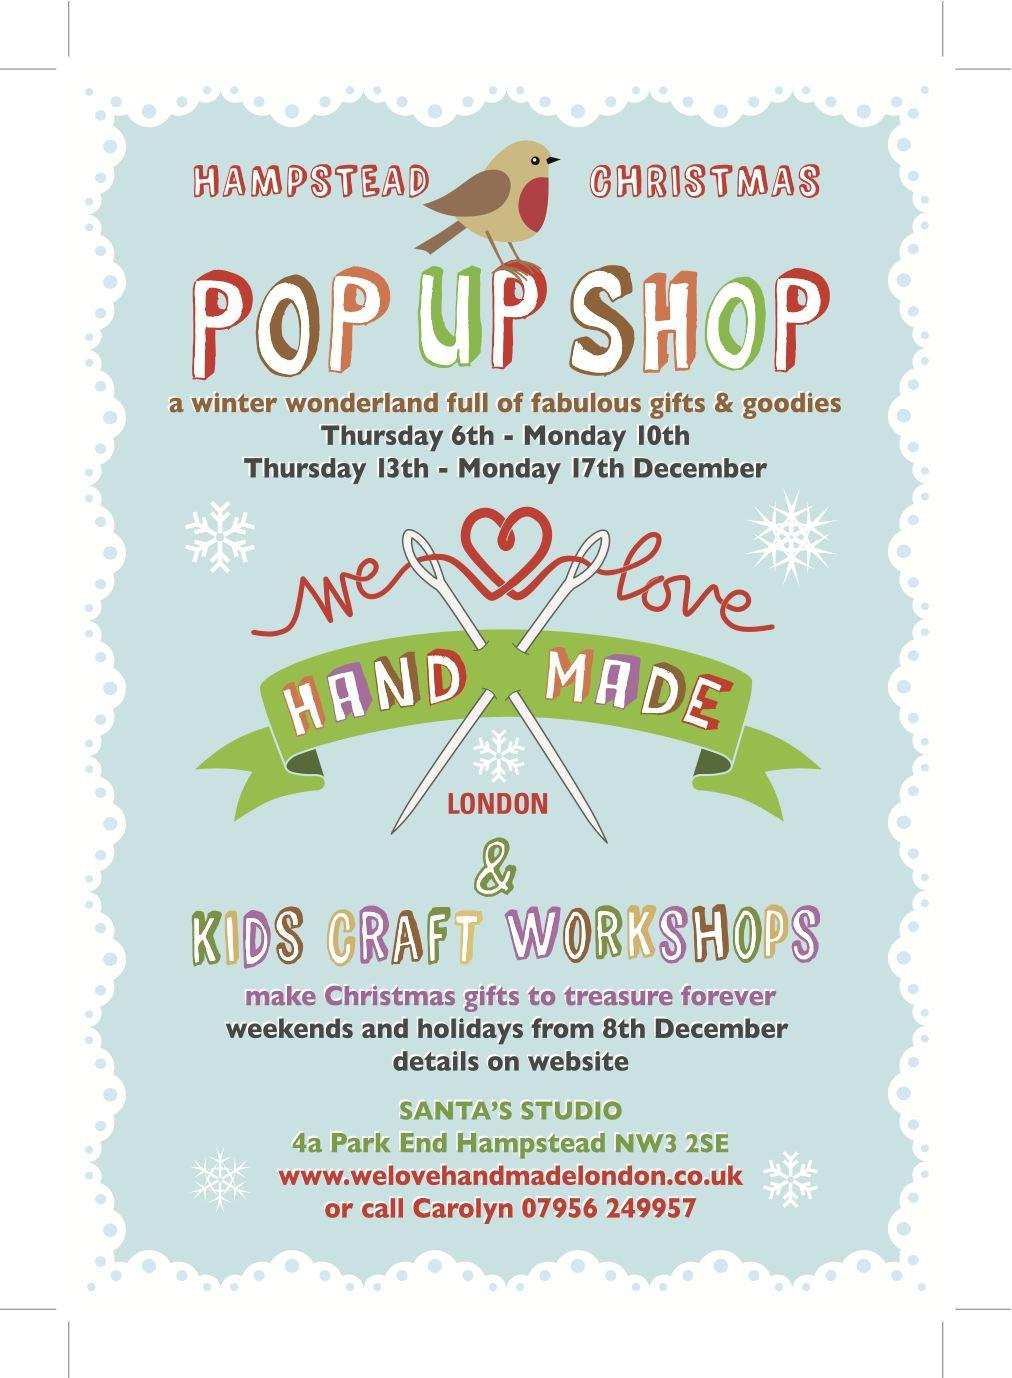 London Pop Ups We Love Handmade Pop Up Shop And Kids